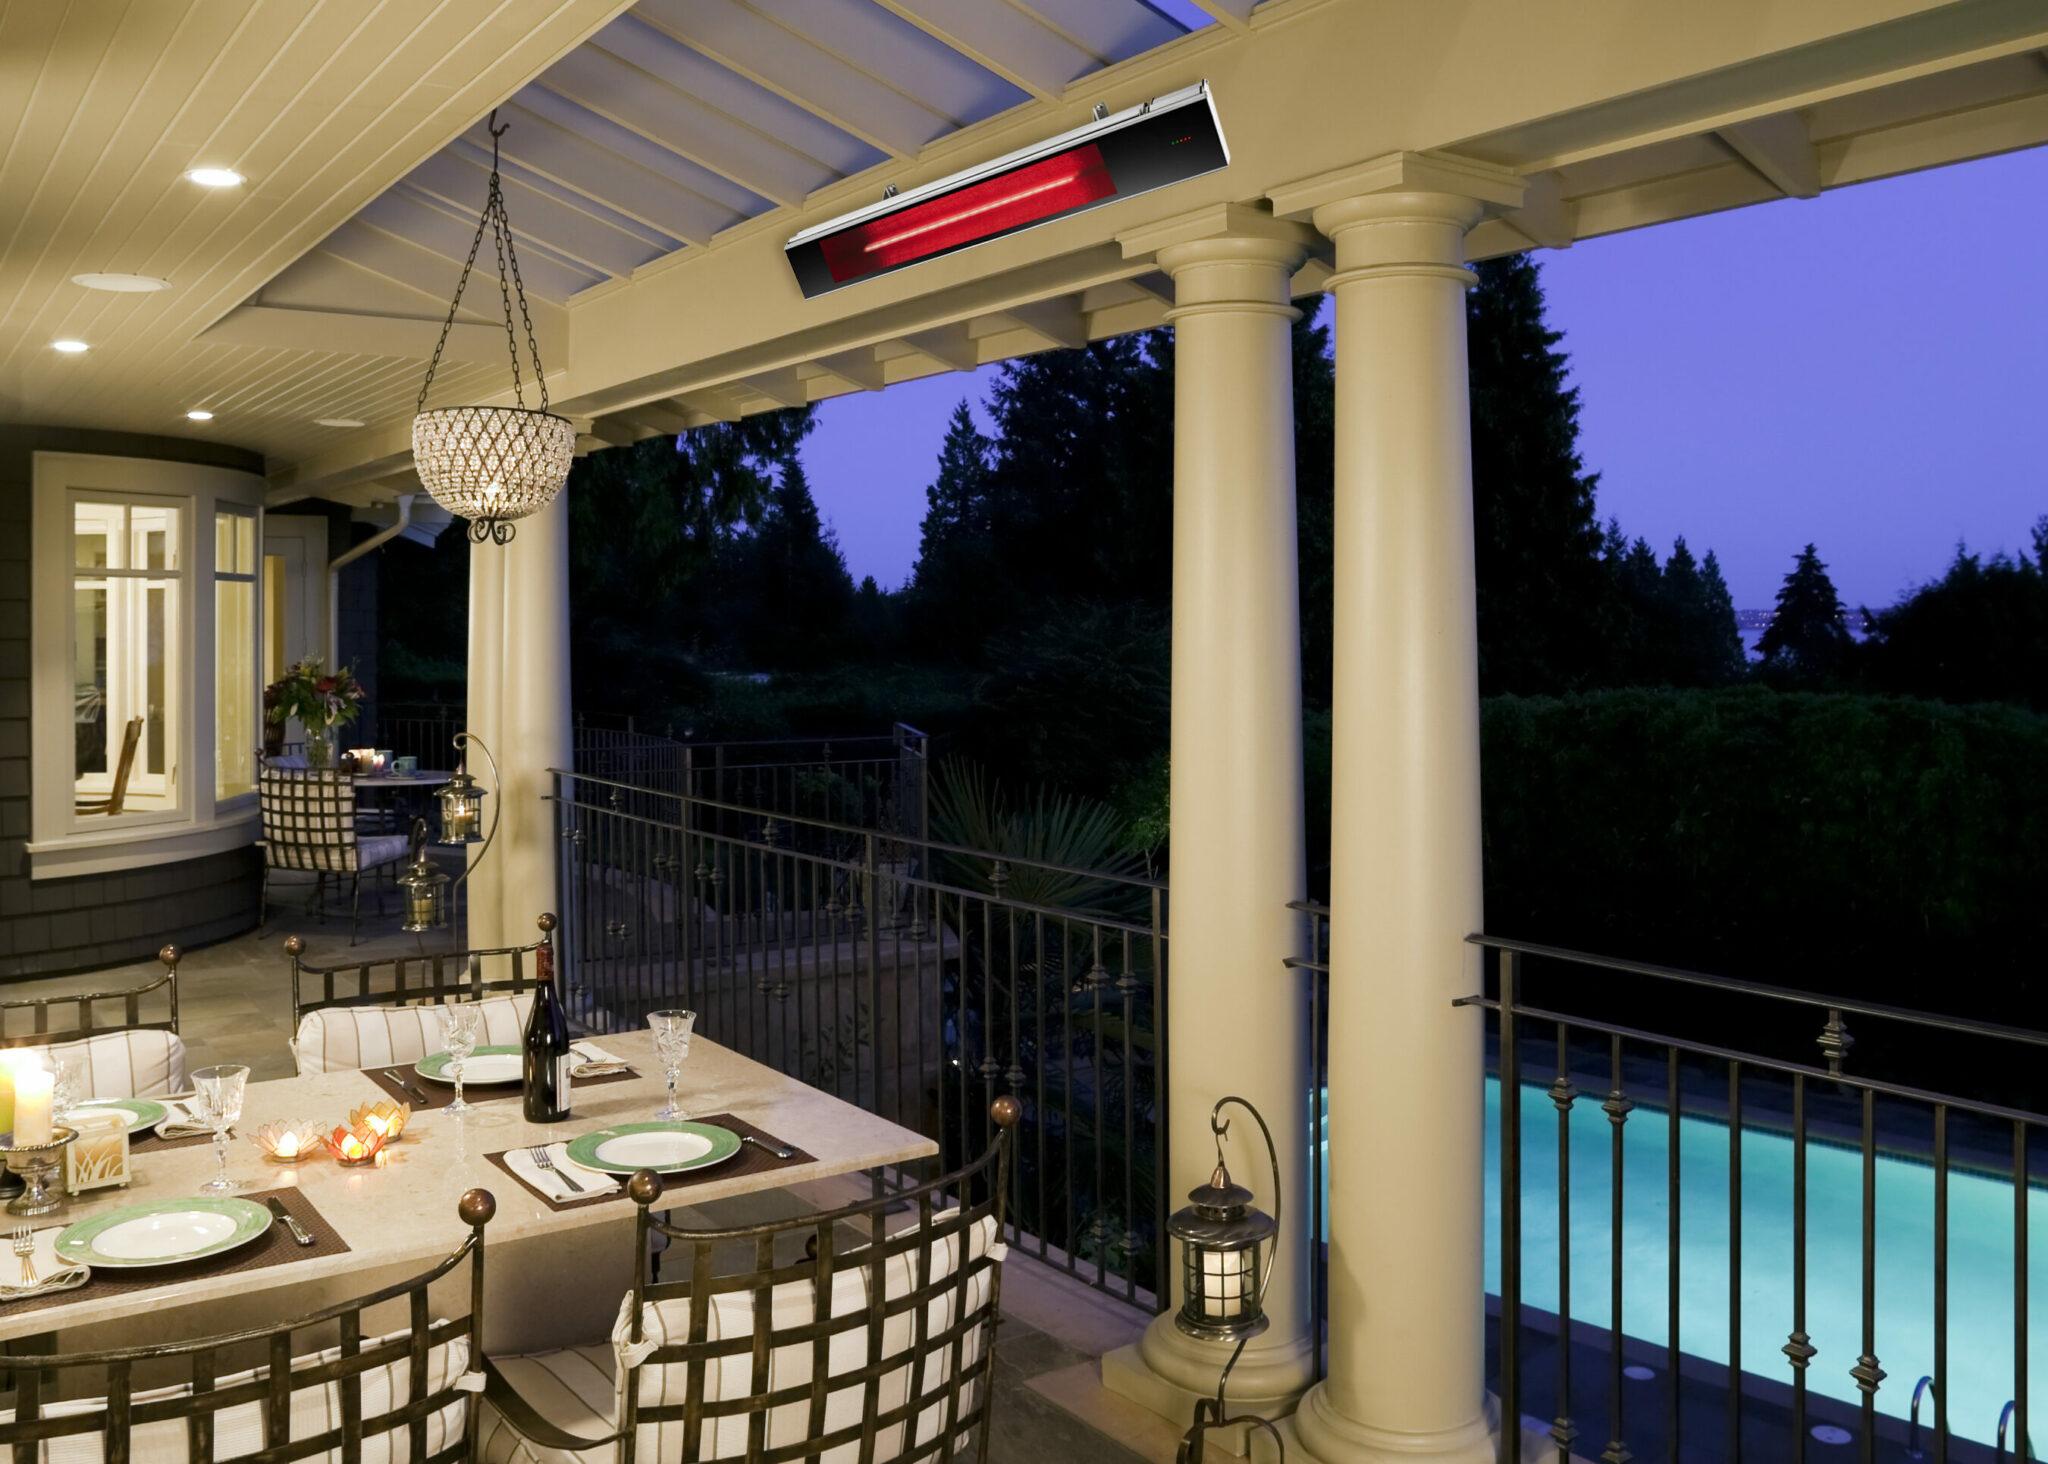 dimplex outdoor heater